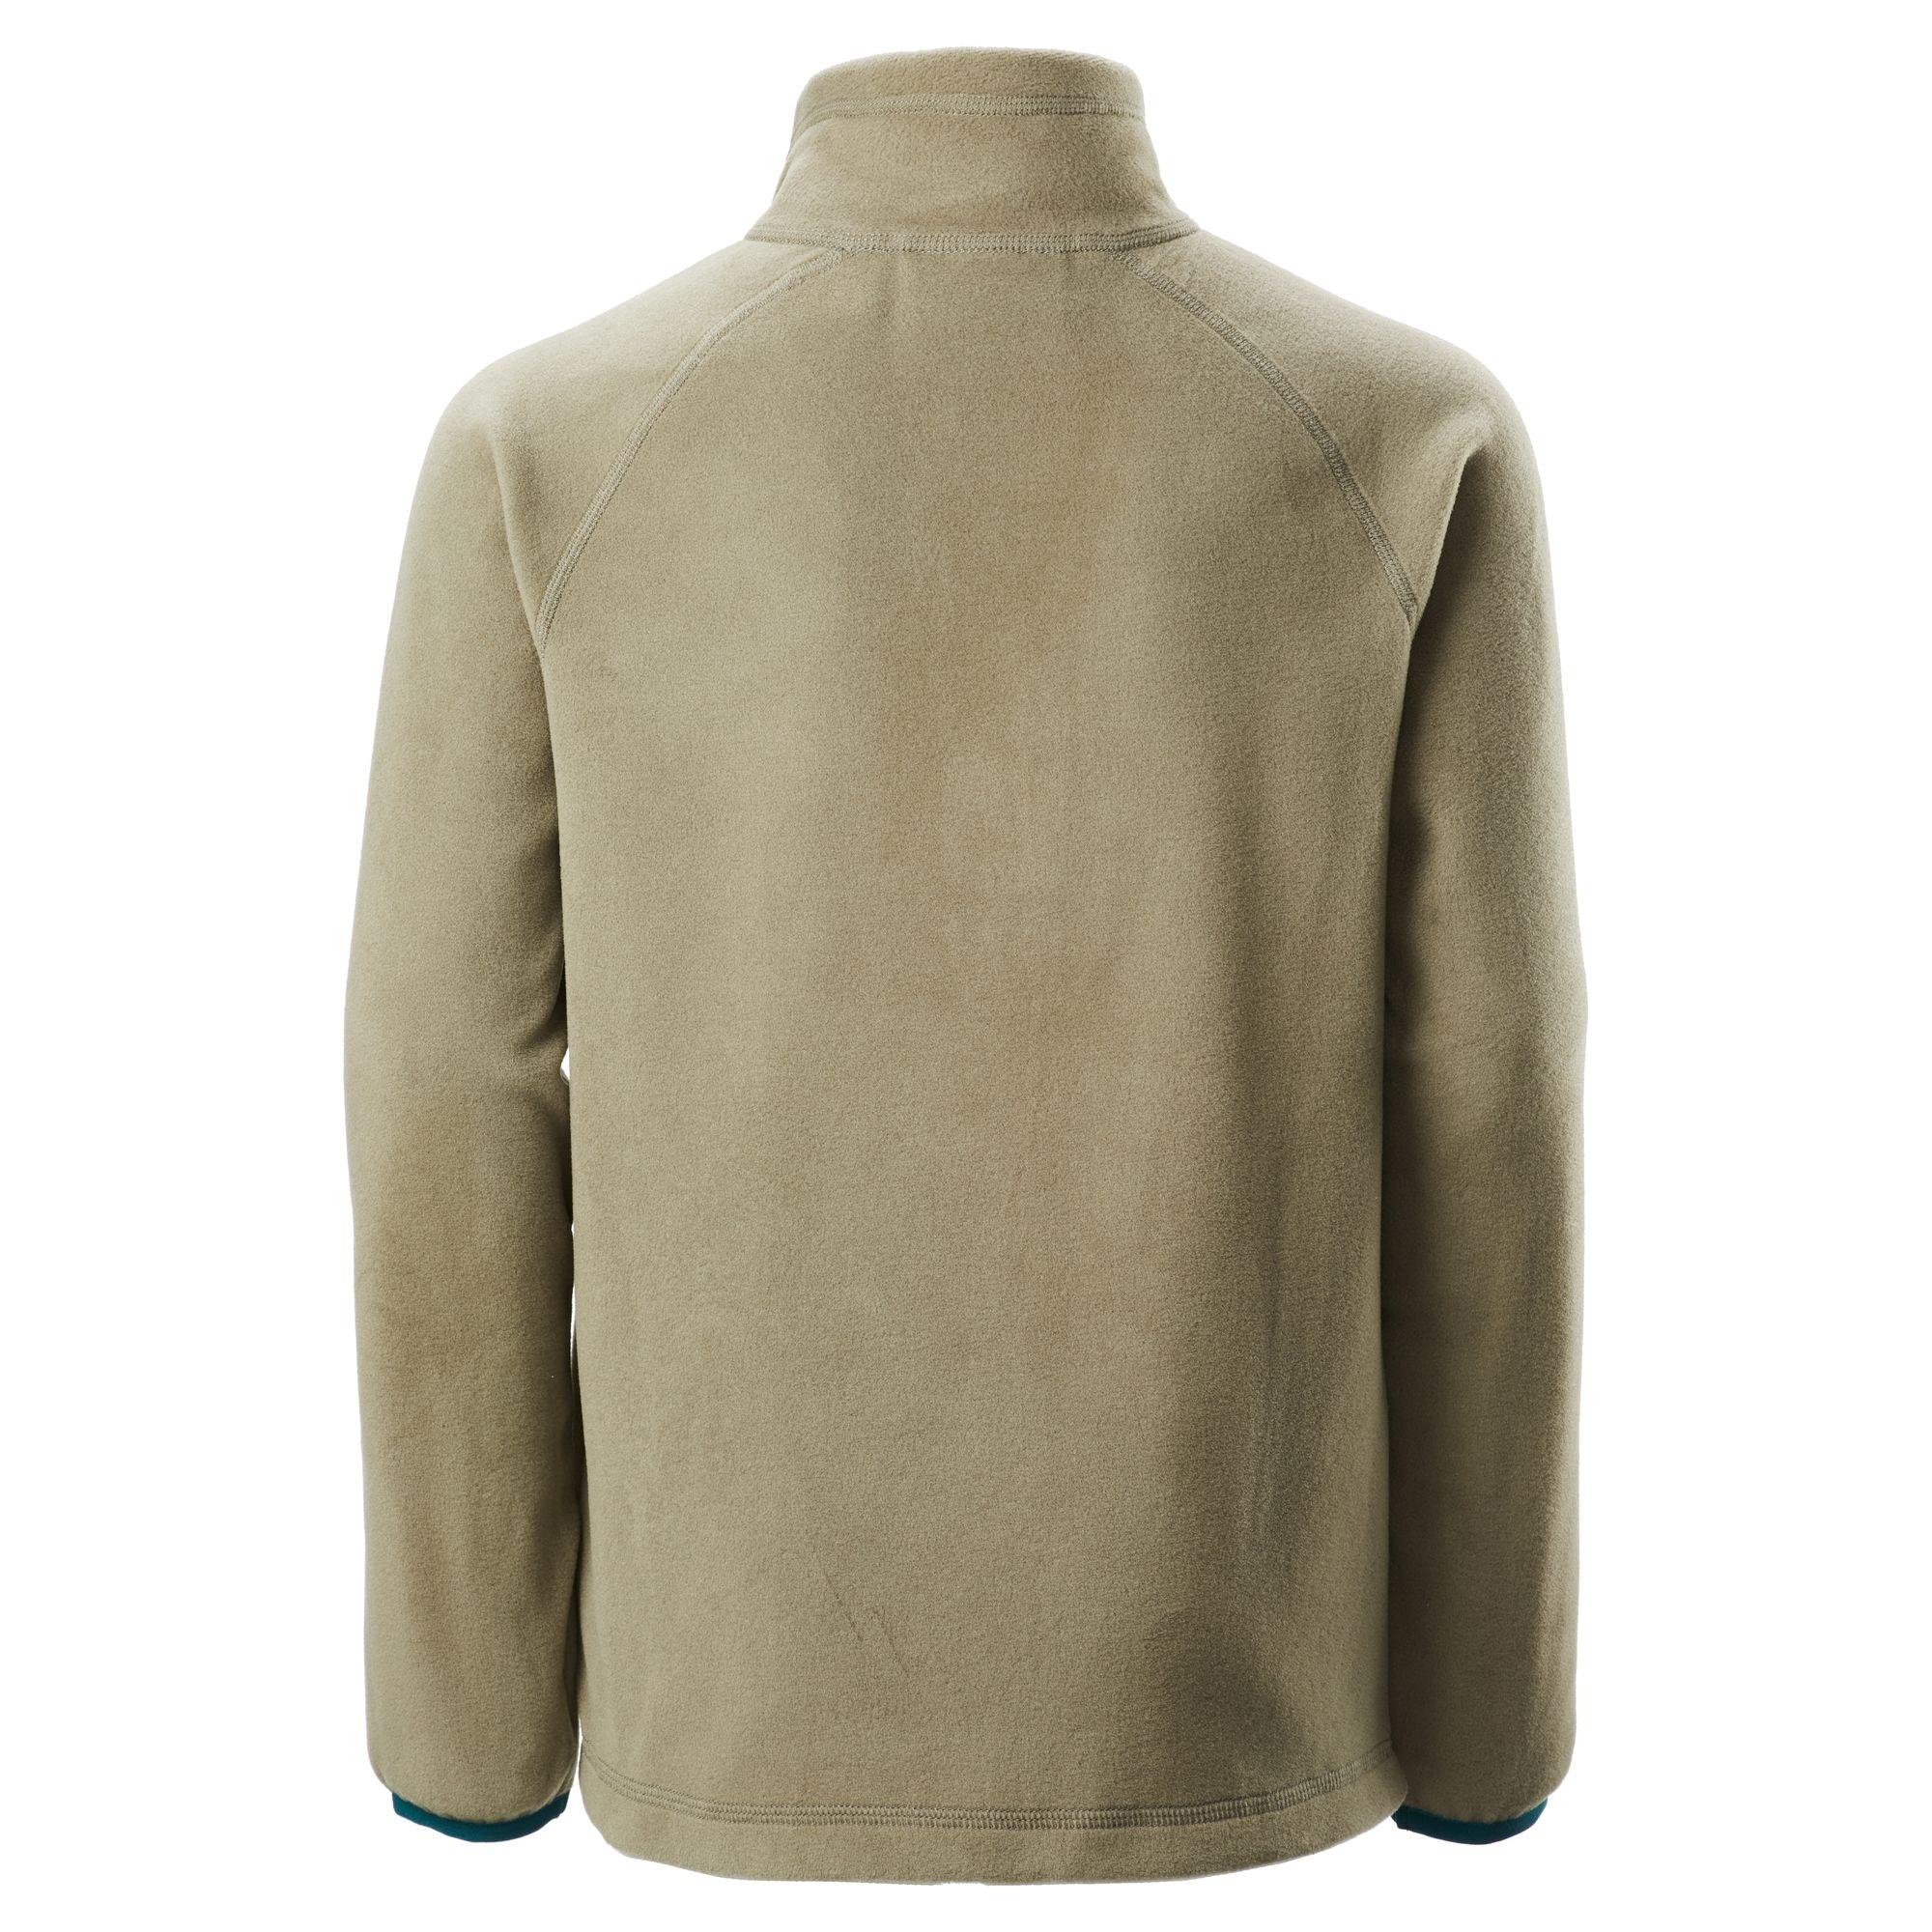 NEW-Kathmandu-Ridge-Kids-039-Girls-039-Boys-039-Warm-Fleece-Jacket-1-4-Zip-Pullover-Top thumbnail 8